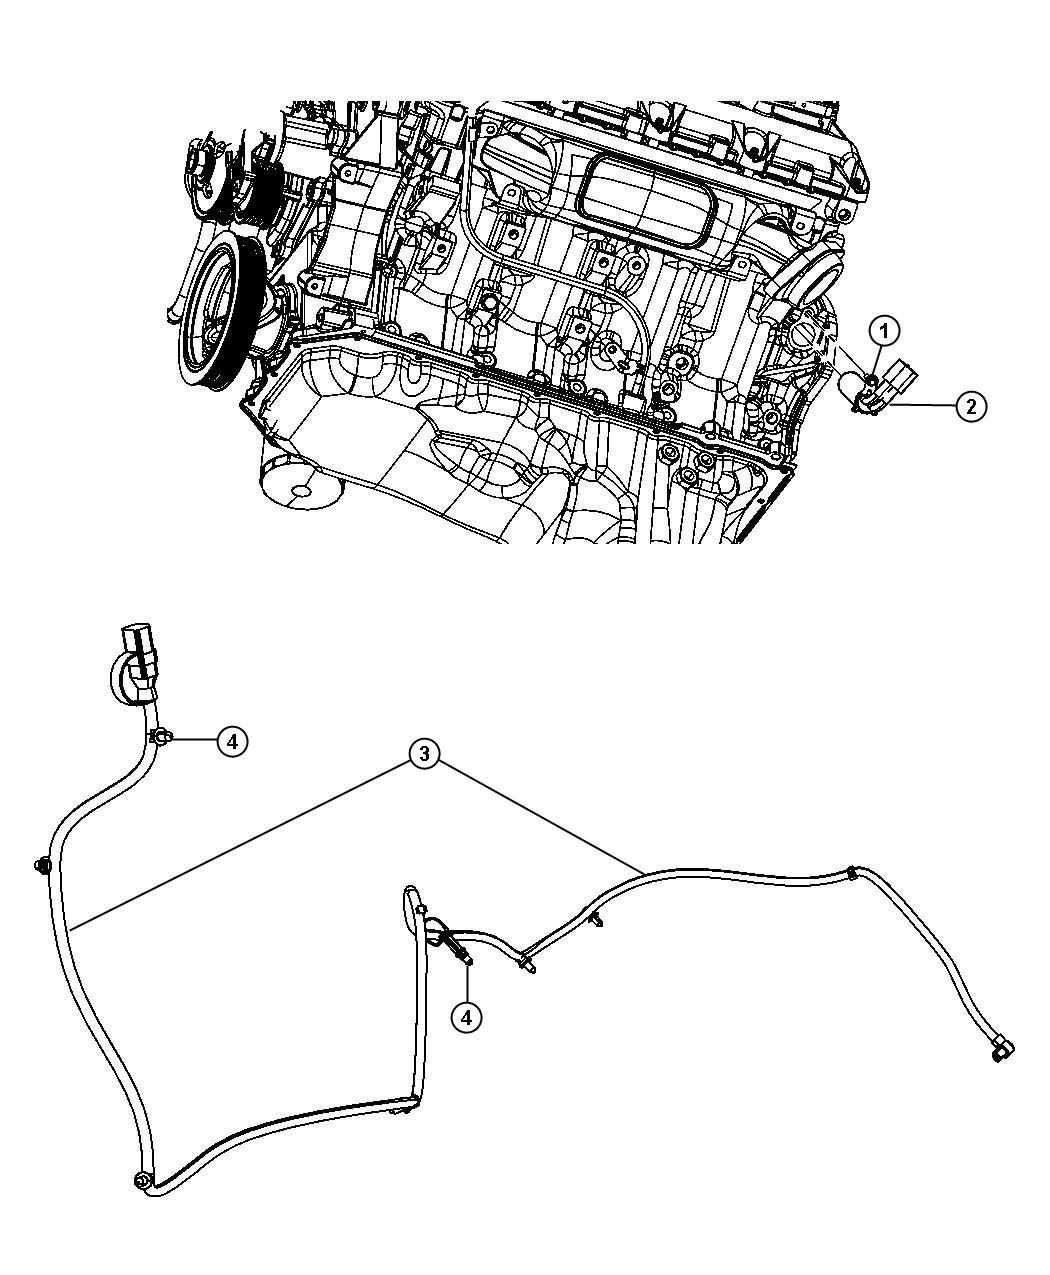 Ram 1500 Cord. Engine block heater. Mds, hemi, cylinder